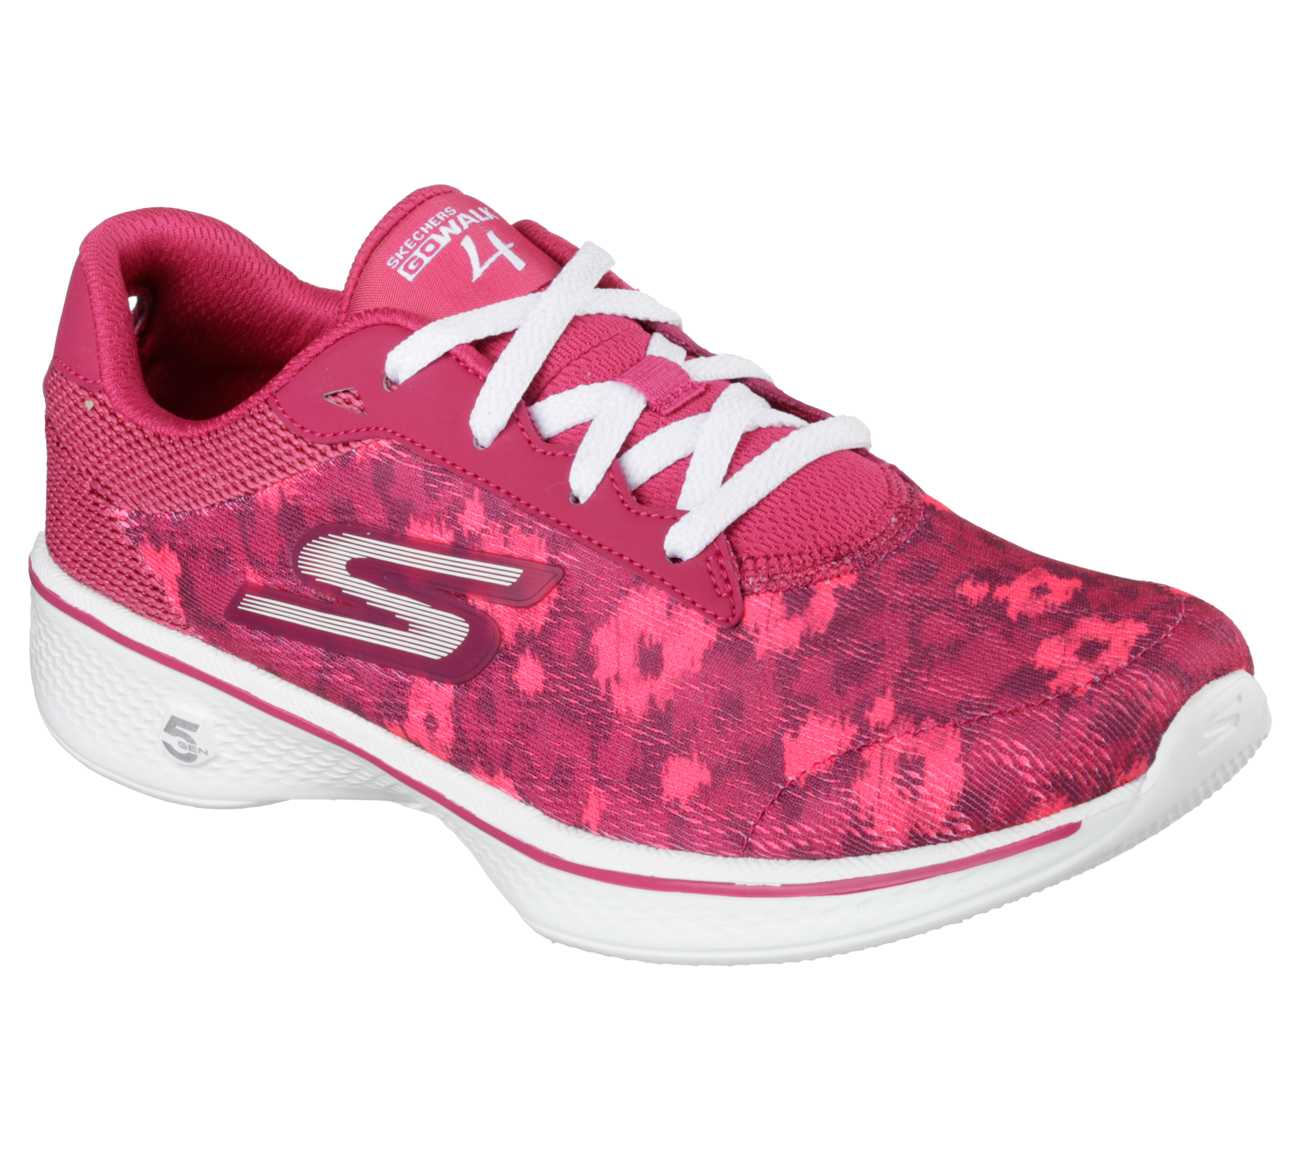 Buy SKECHERS Skechers GOwalk 4 Excite Performance Shoes